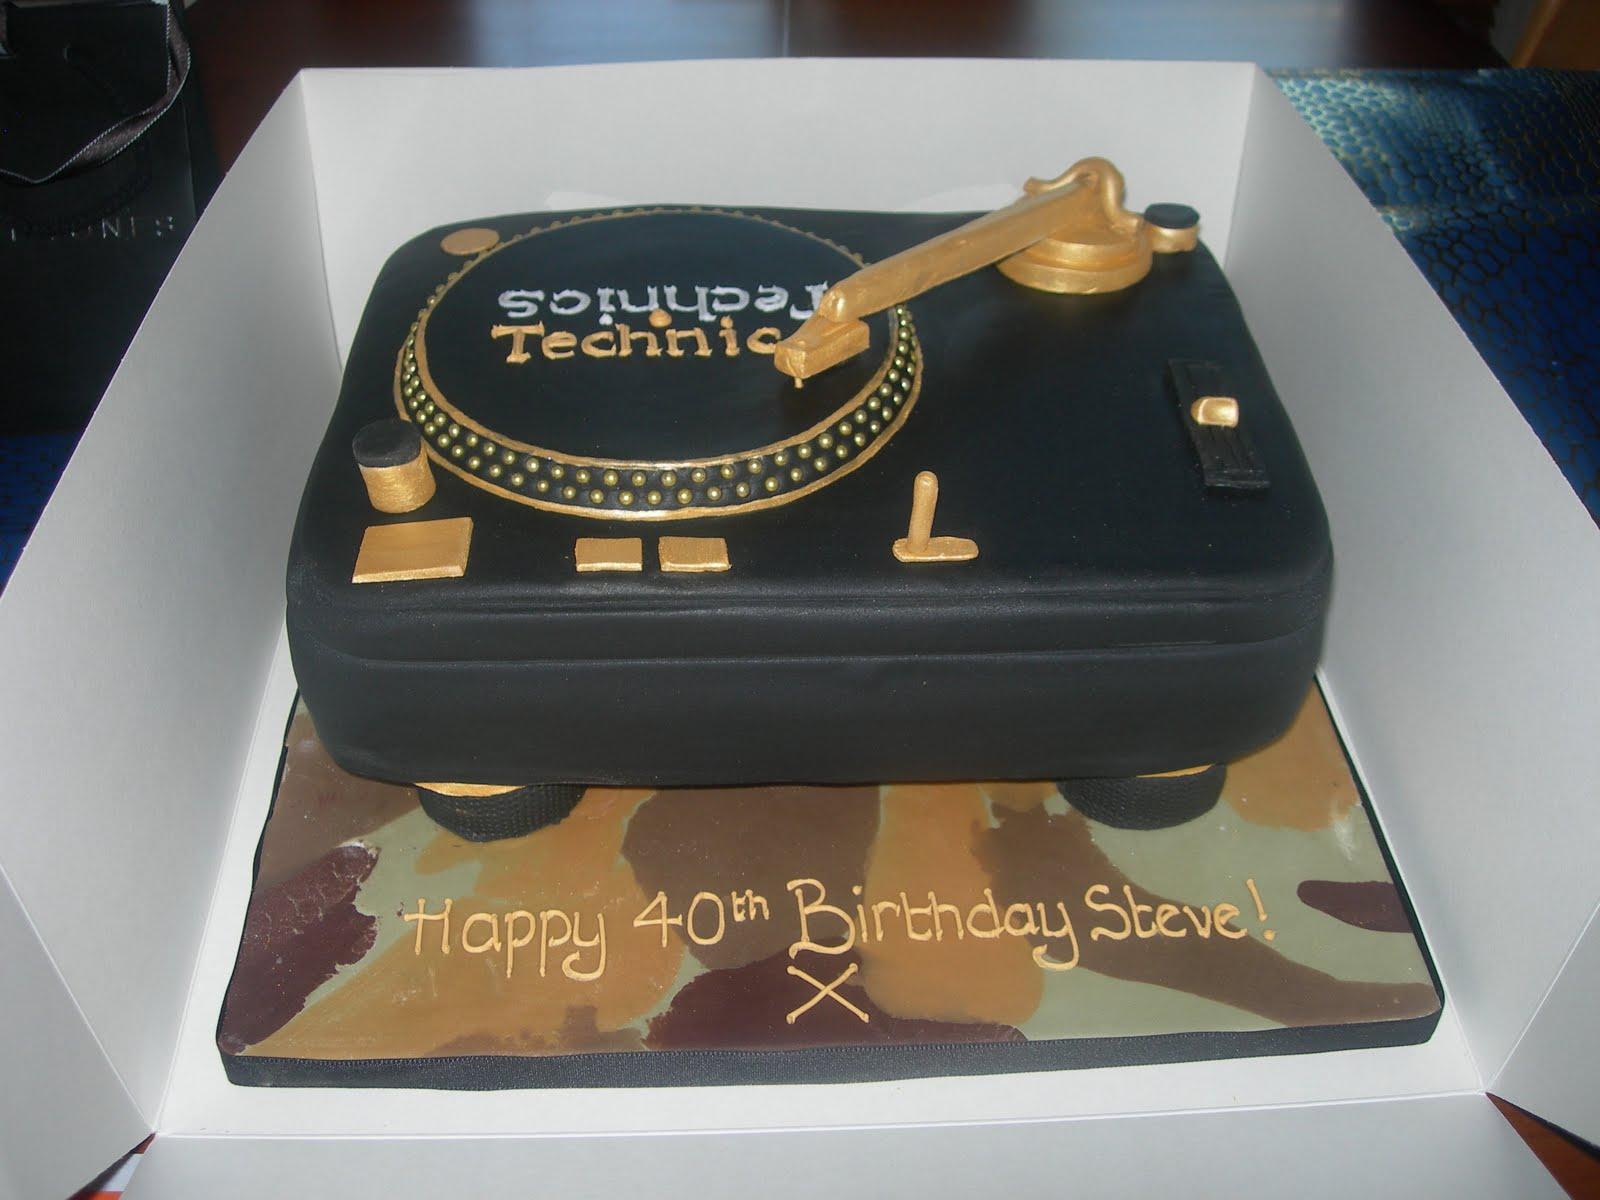 Custom Cake Designs Uk : Custom Cake Design: Turntable cake Steve s 40th